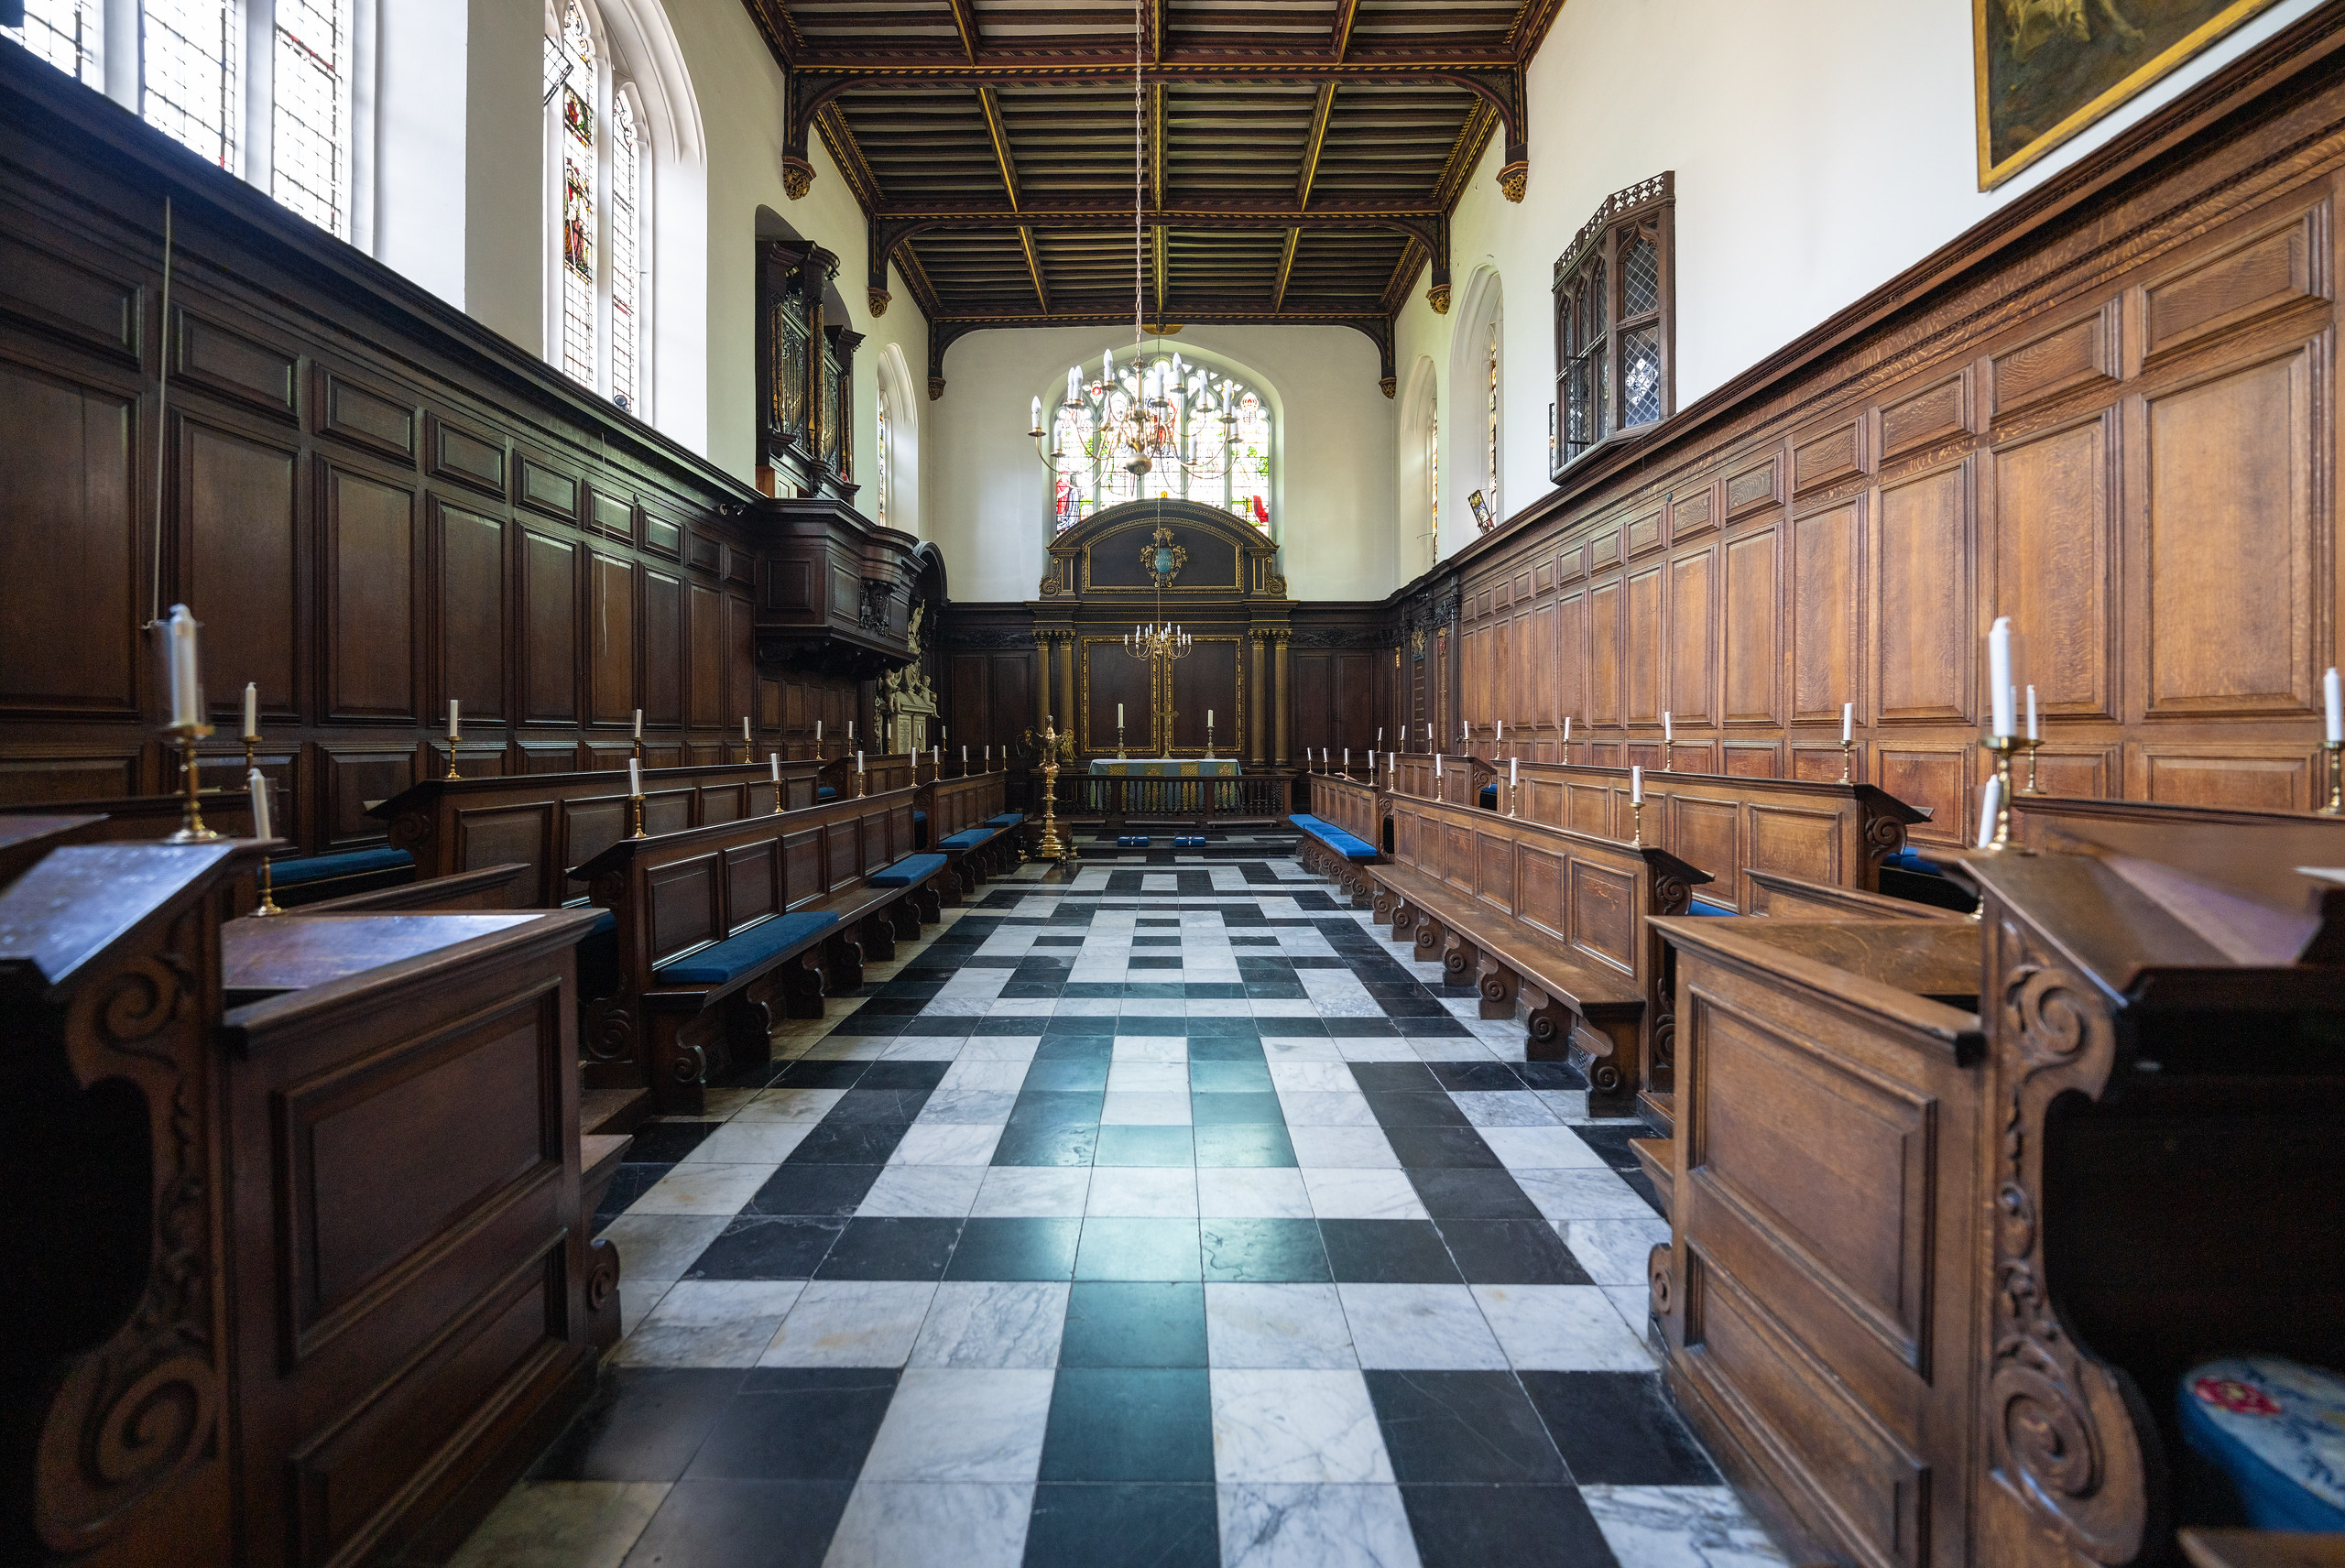 Chapel of Christ's College, Cambridge (Sep 2021)